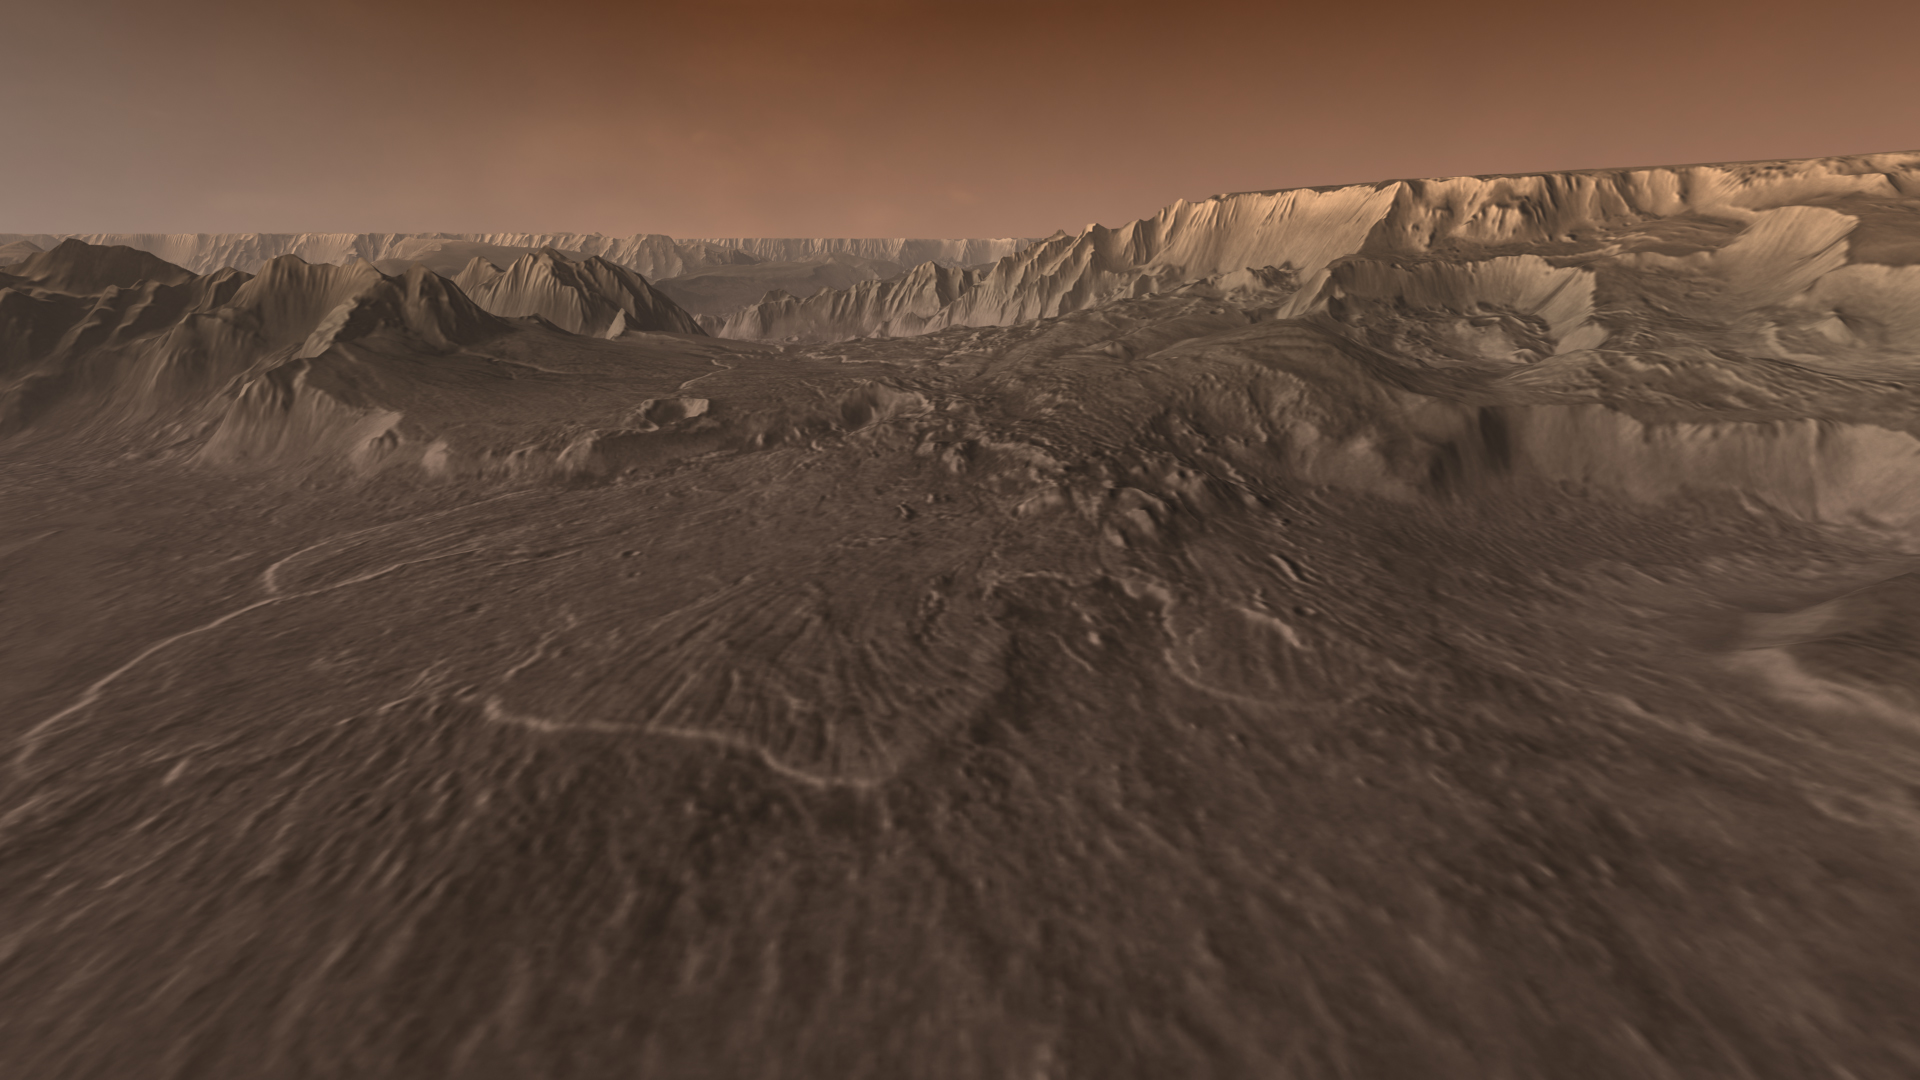 mars canyon nasa - photo #6